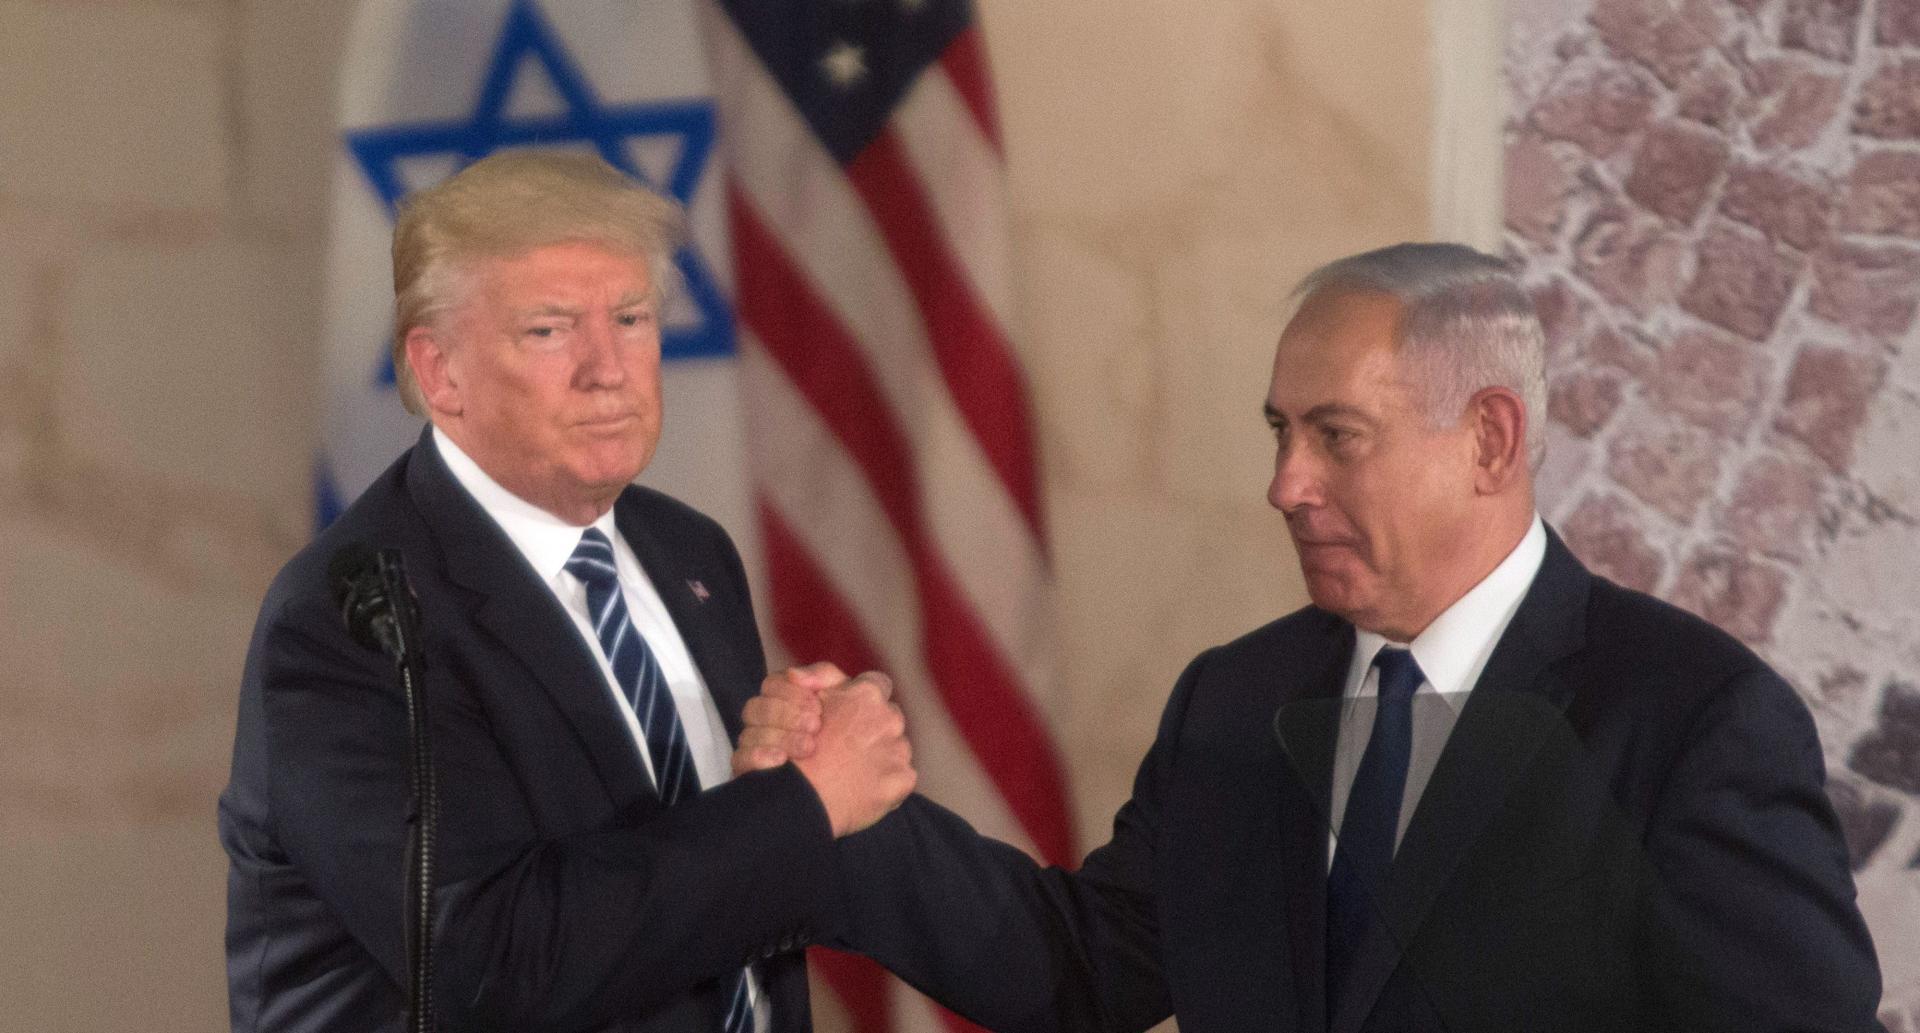 Presedintele SUA, Donald Trump, are o relatie apropiata cu premierul israelian Benjamin Netanyahu